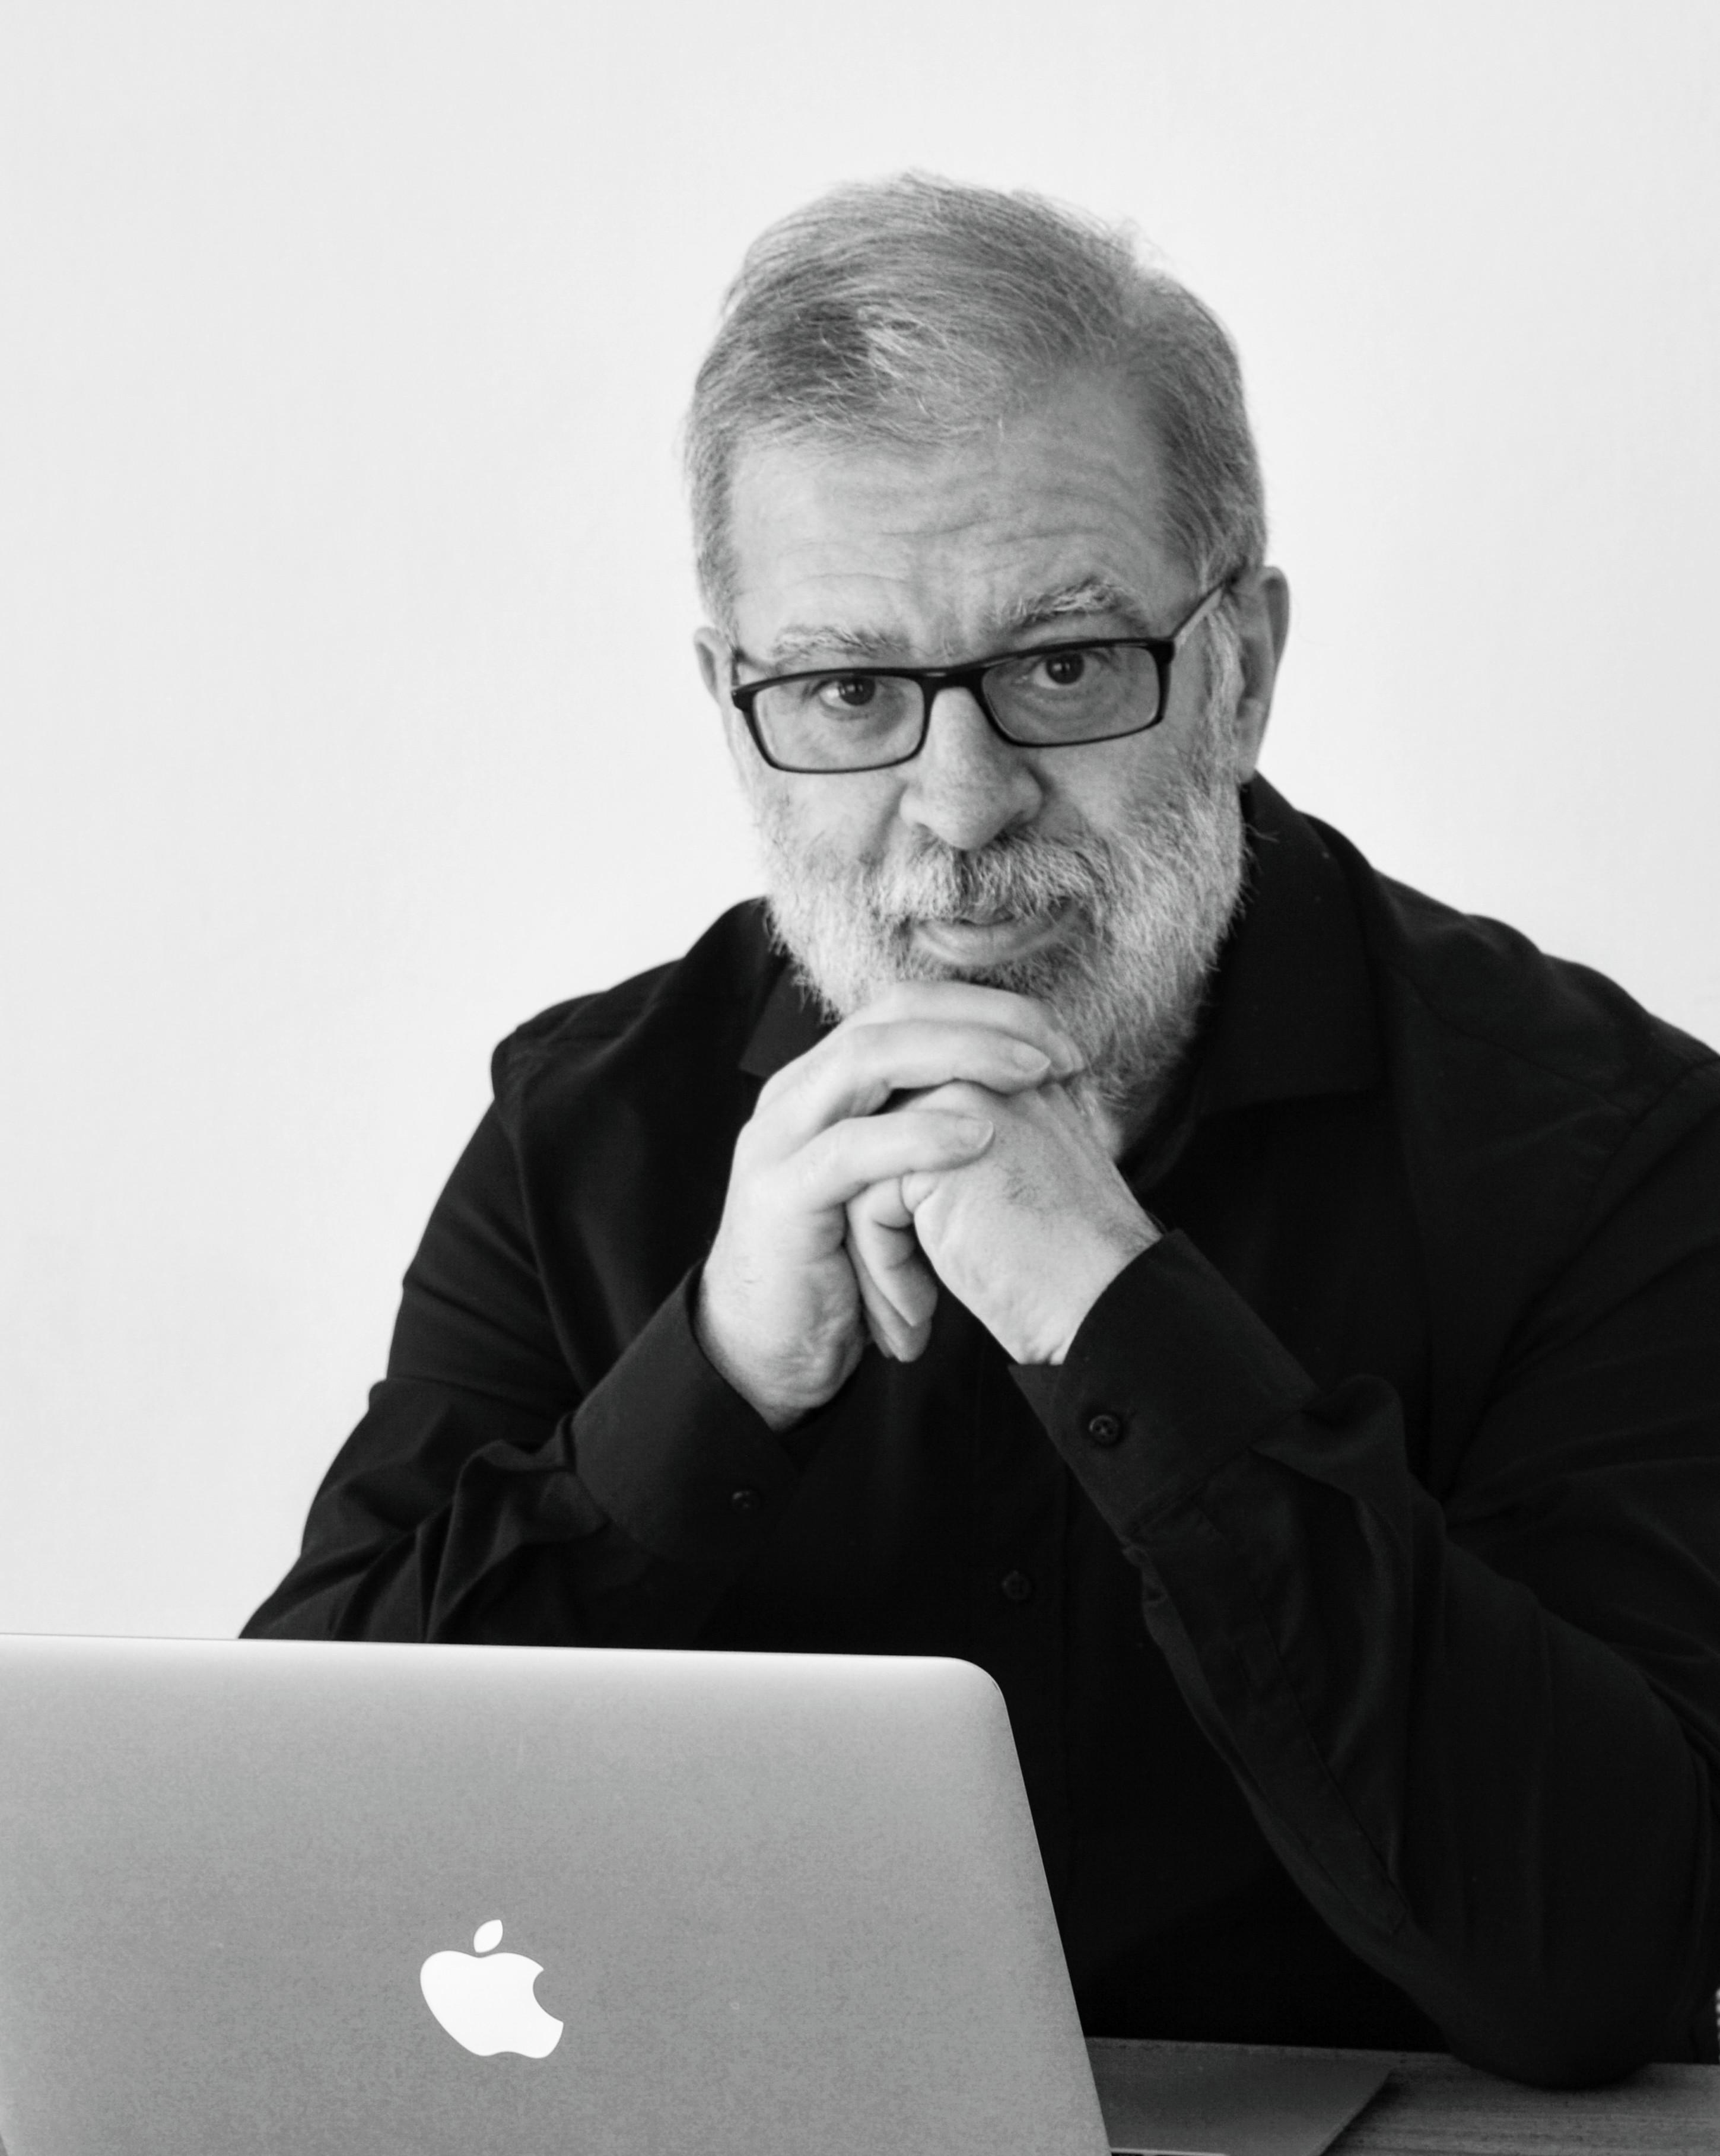 Daniel Eskibel consultor politico